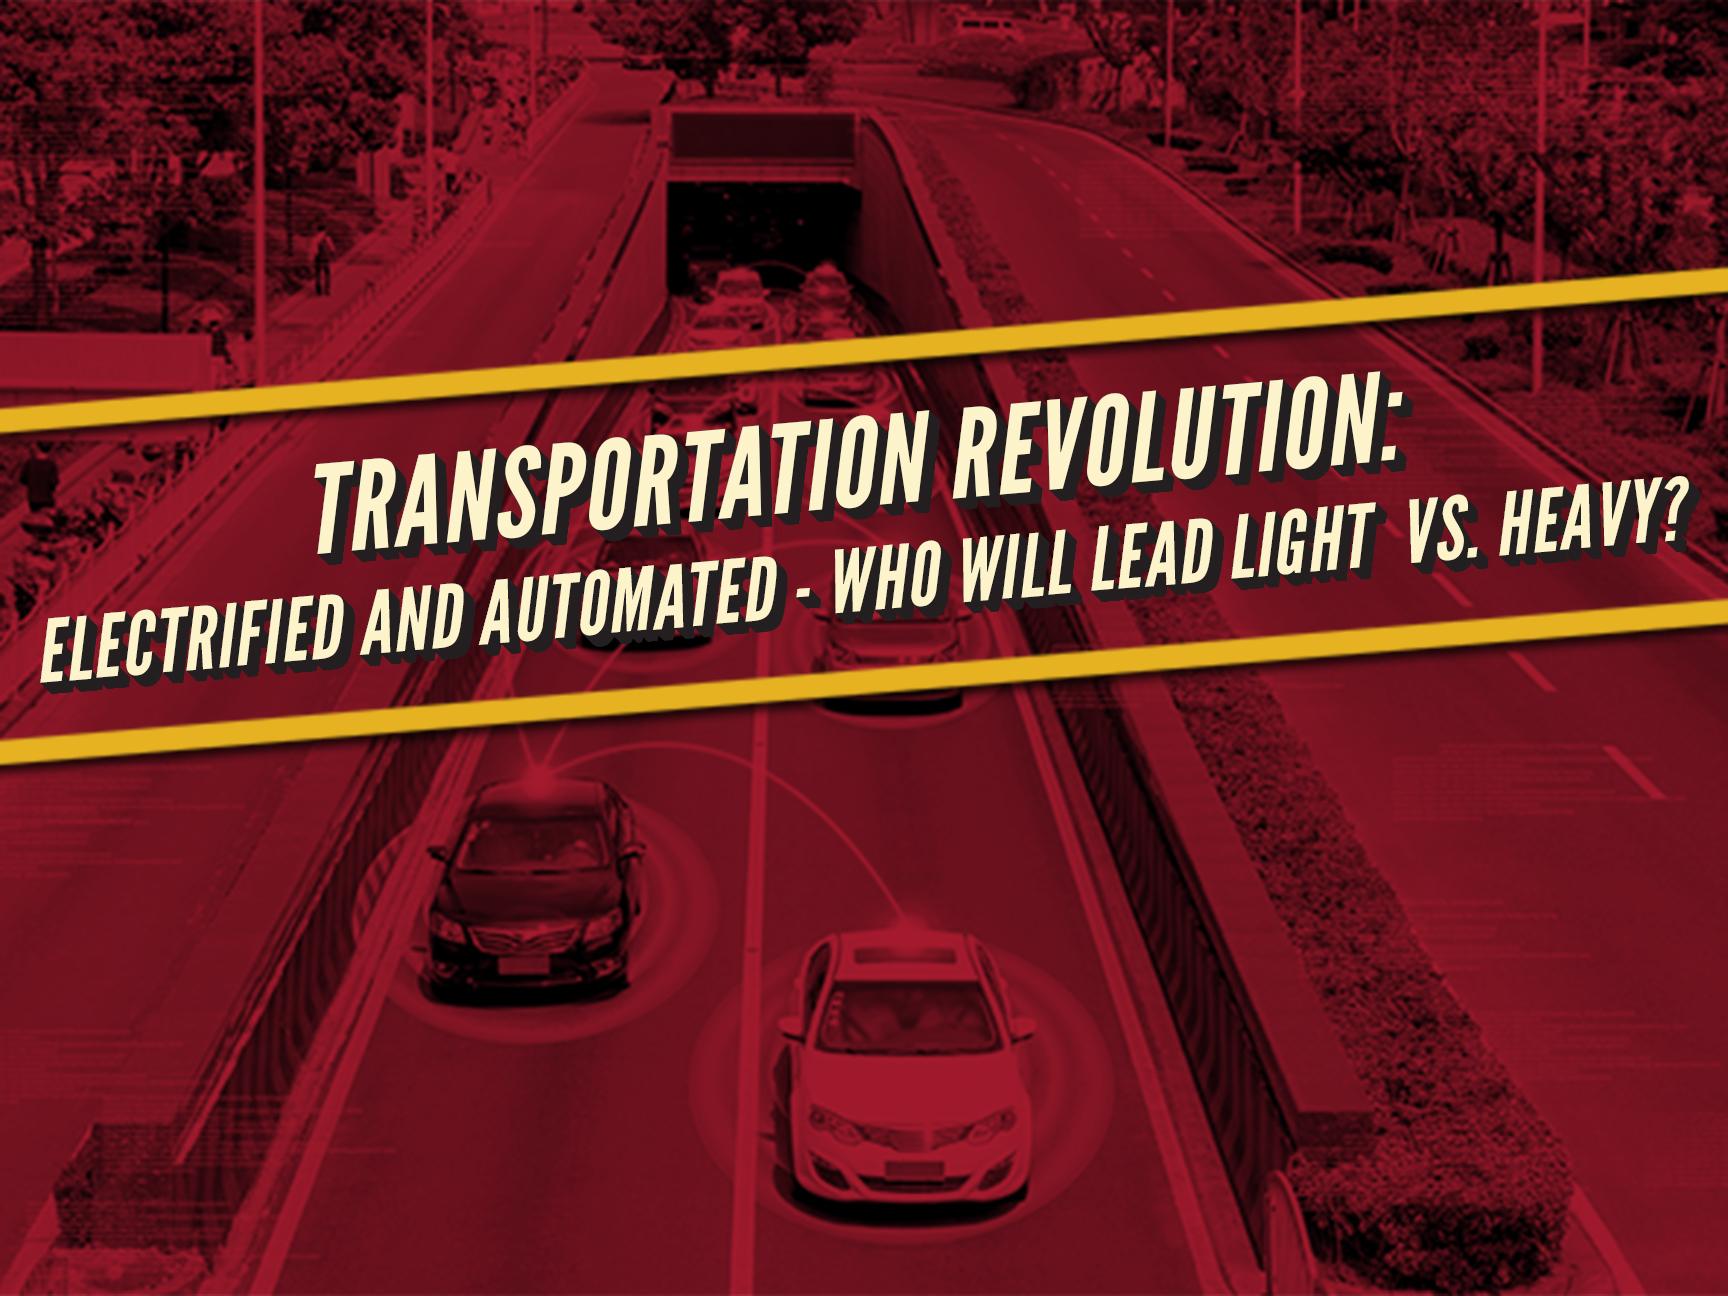 Transportation Revolution Symposium Banner Image